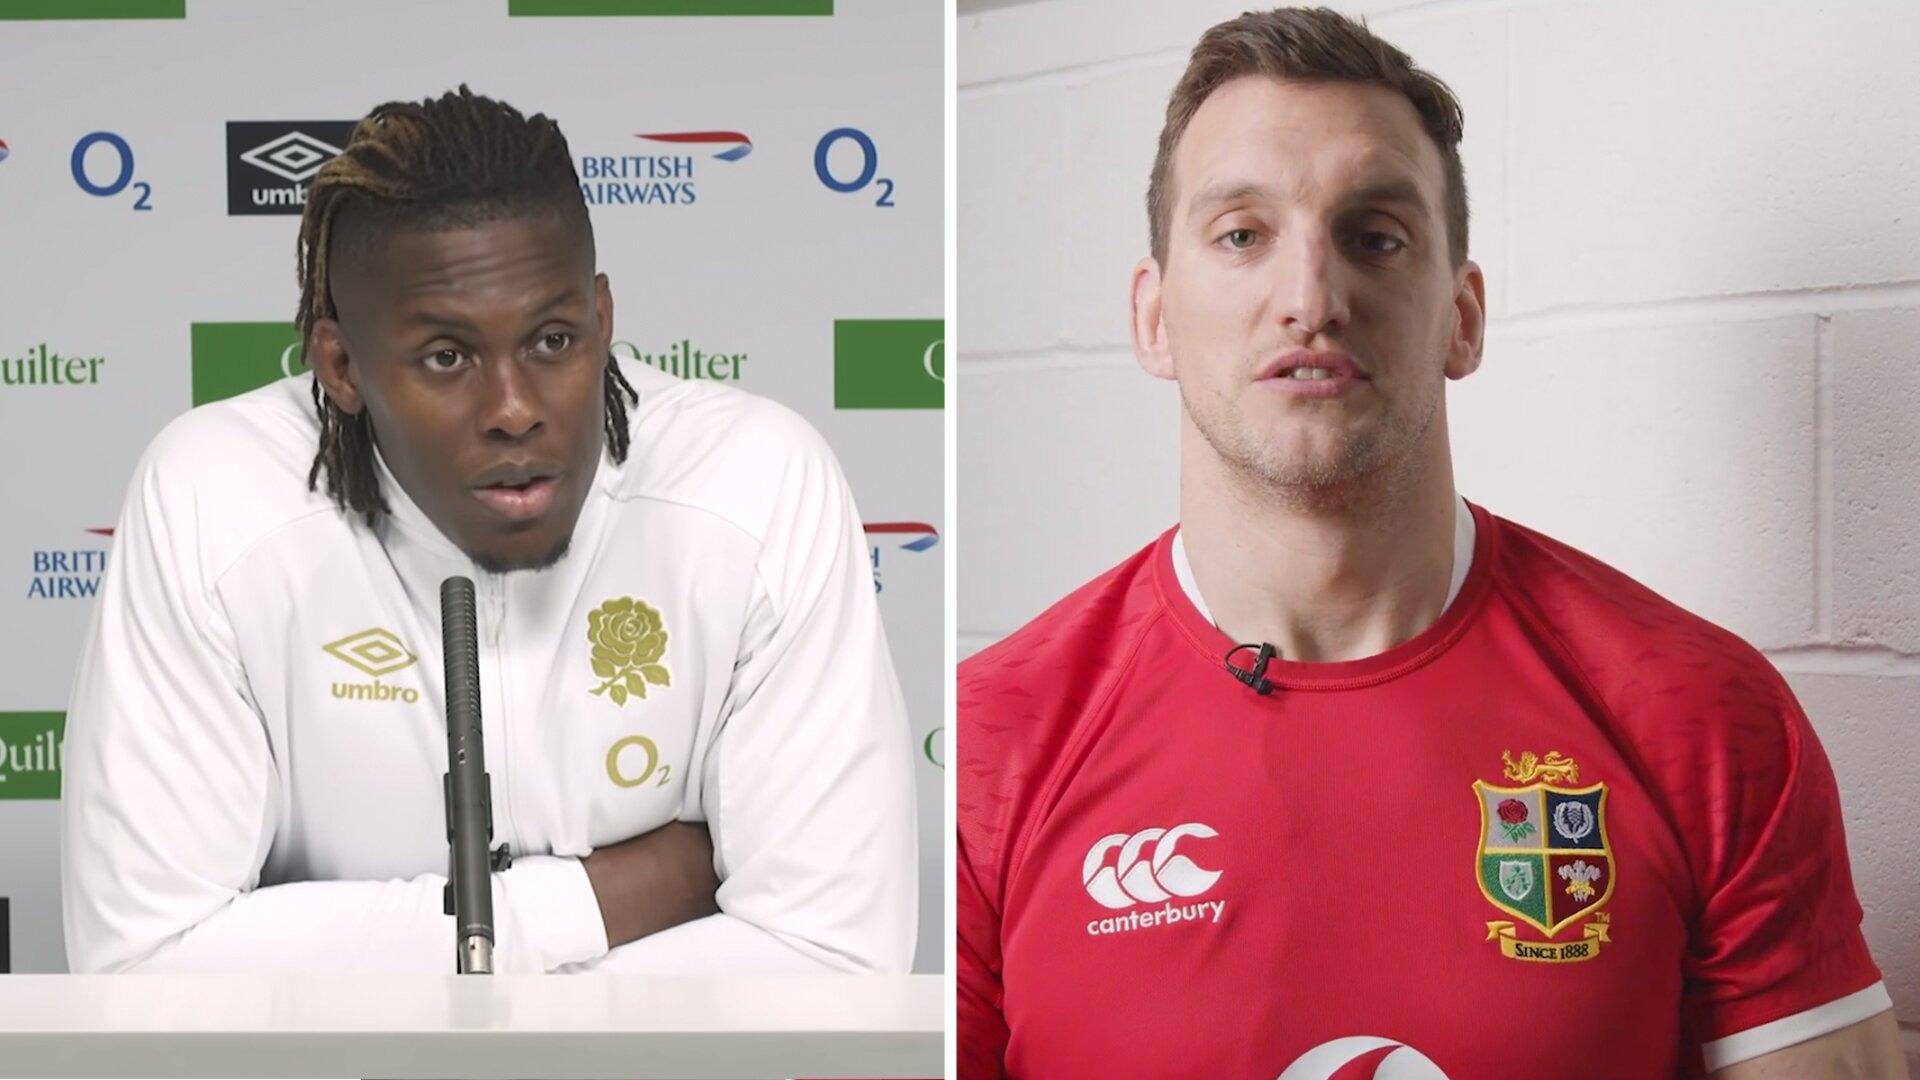 Sam Warburton sensationally backtracks on backing Itoje as Lions captain after criticism online